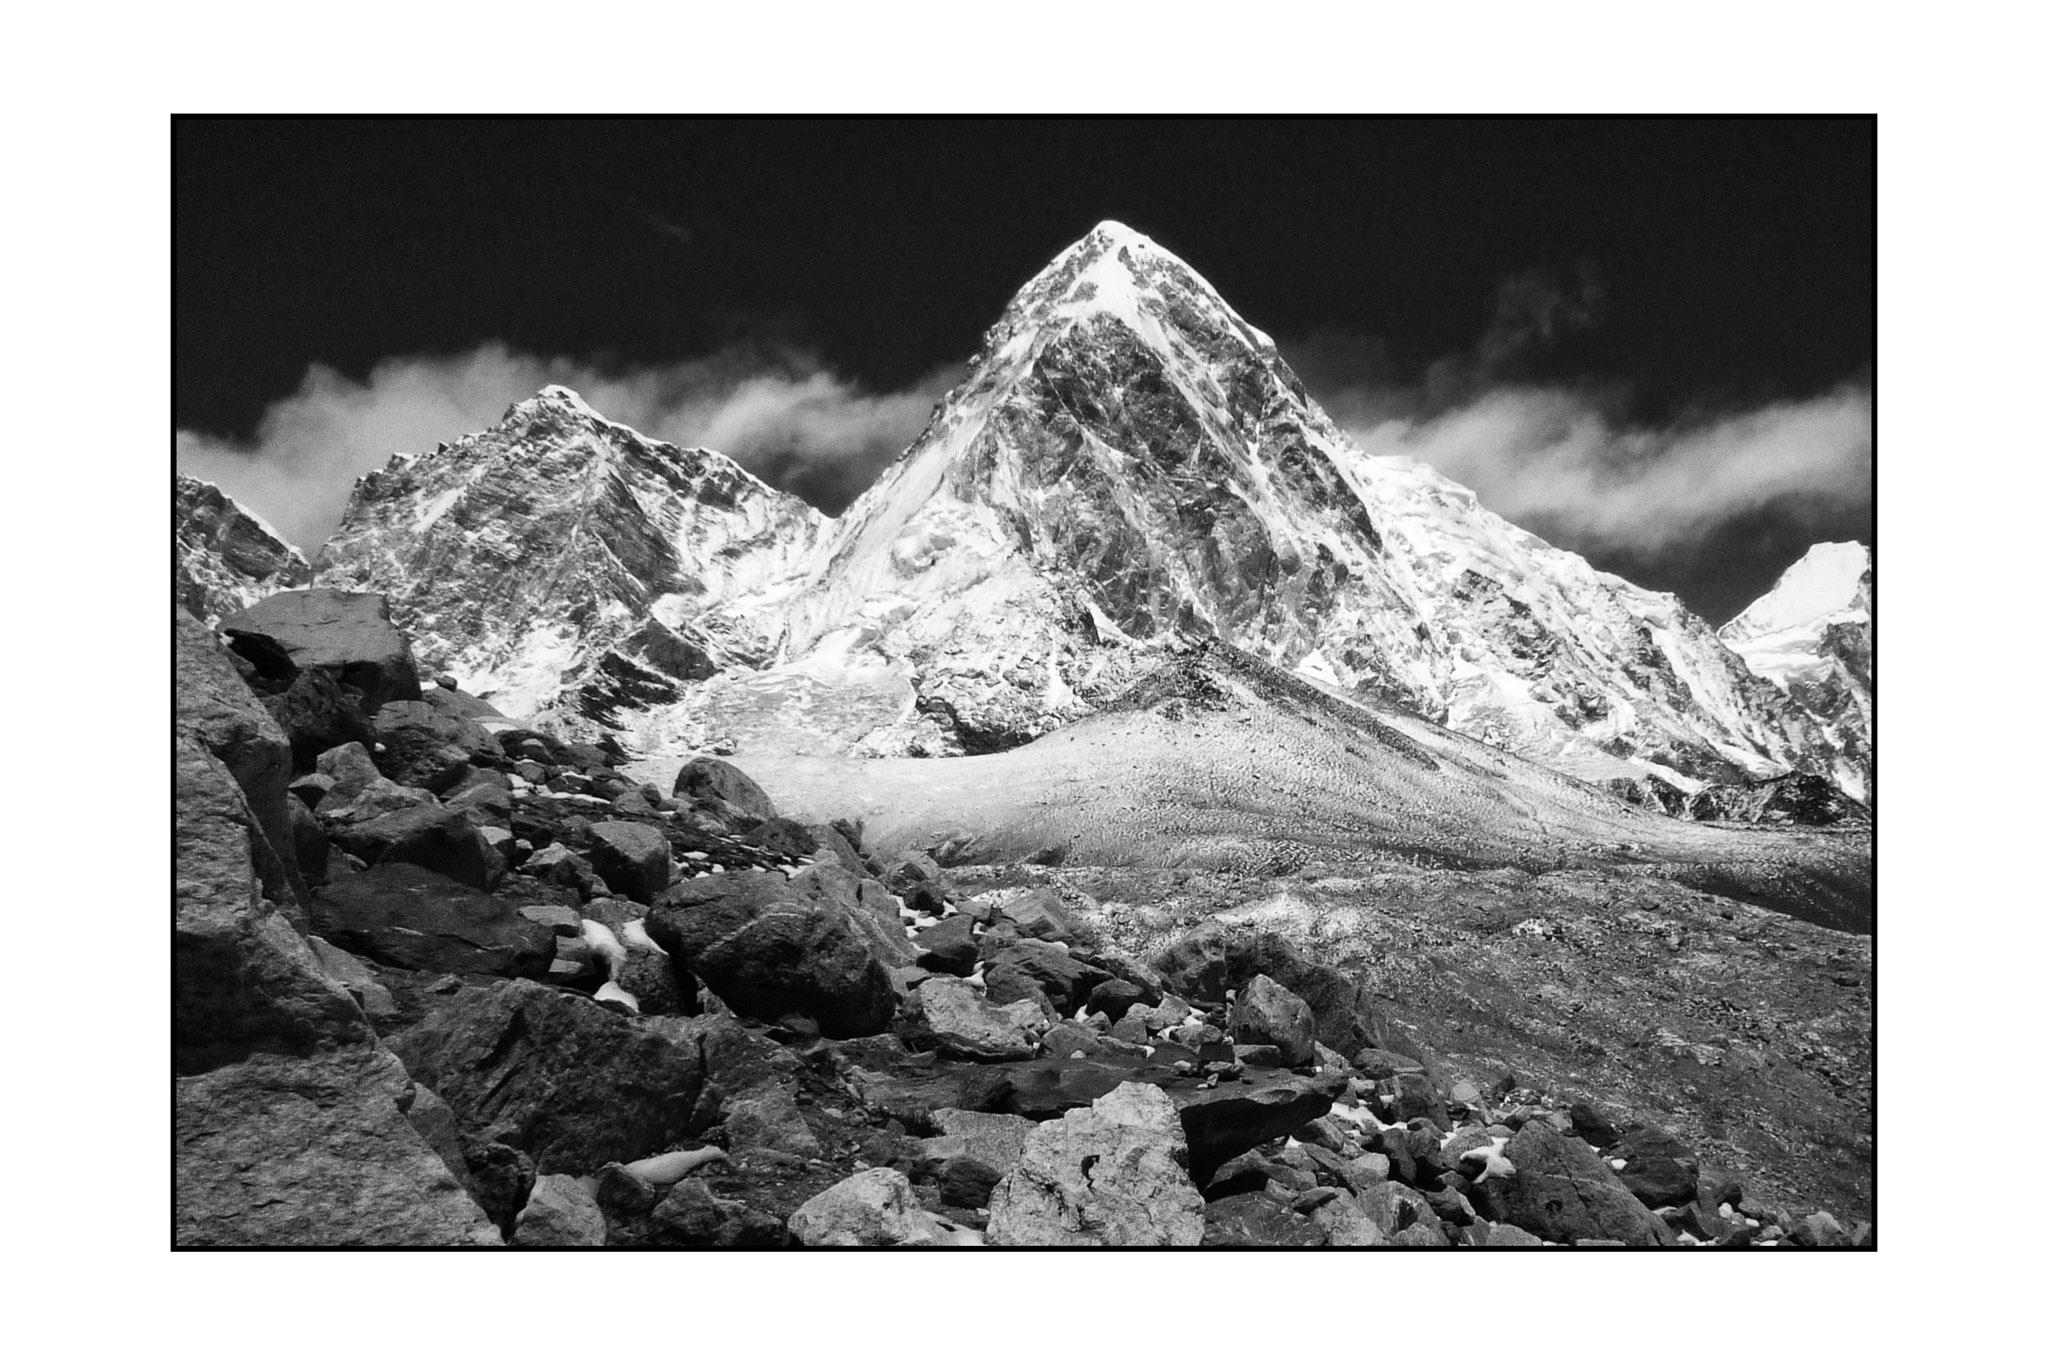 Pumo Ri, Himalaya Mountains, Nepal (2009)